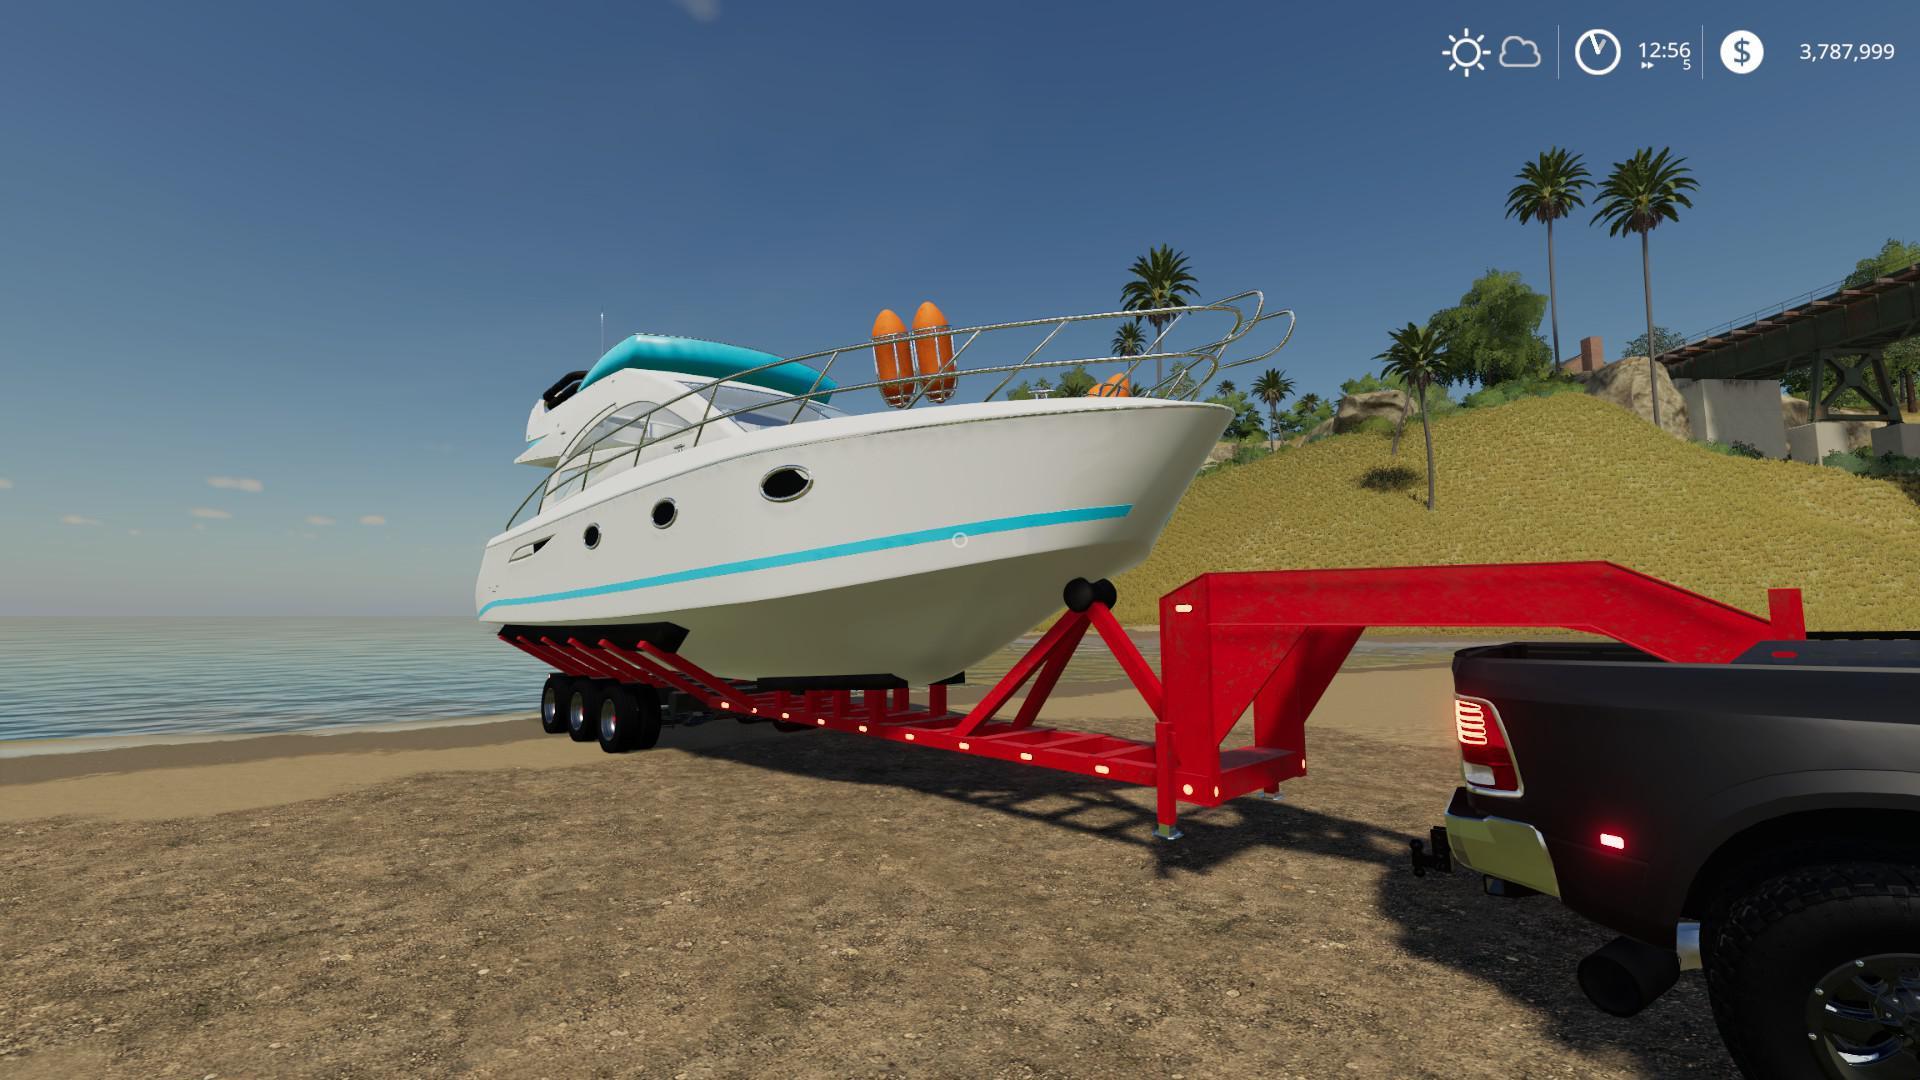 Oversize Boat Trailer v1 0 FS19 - Farming Simulator 19 Mod